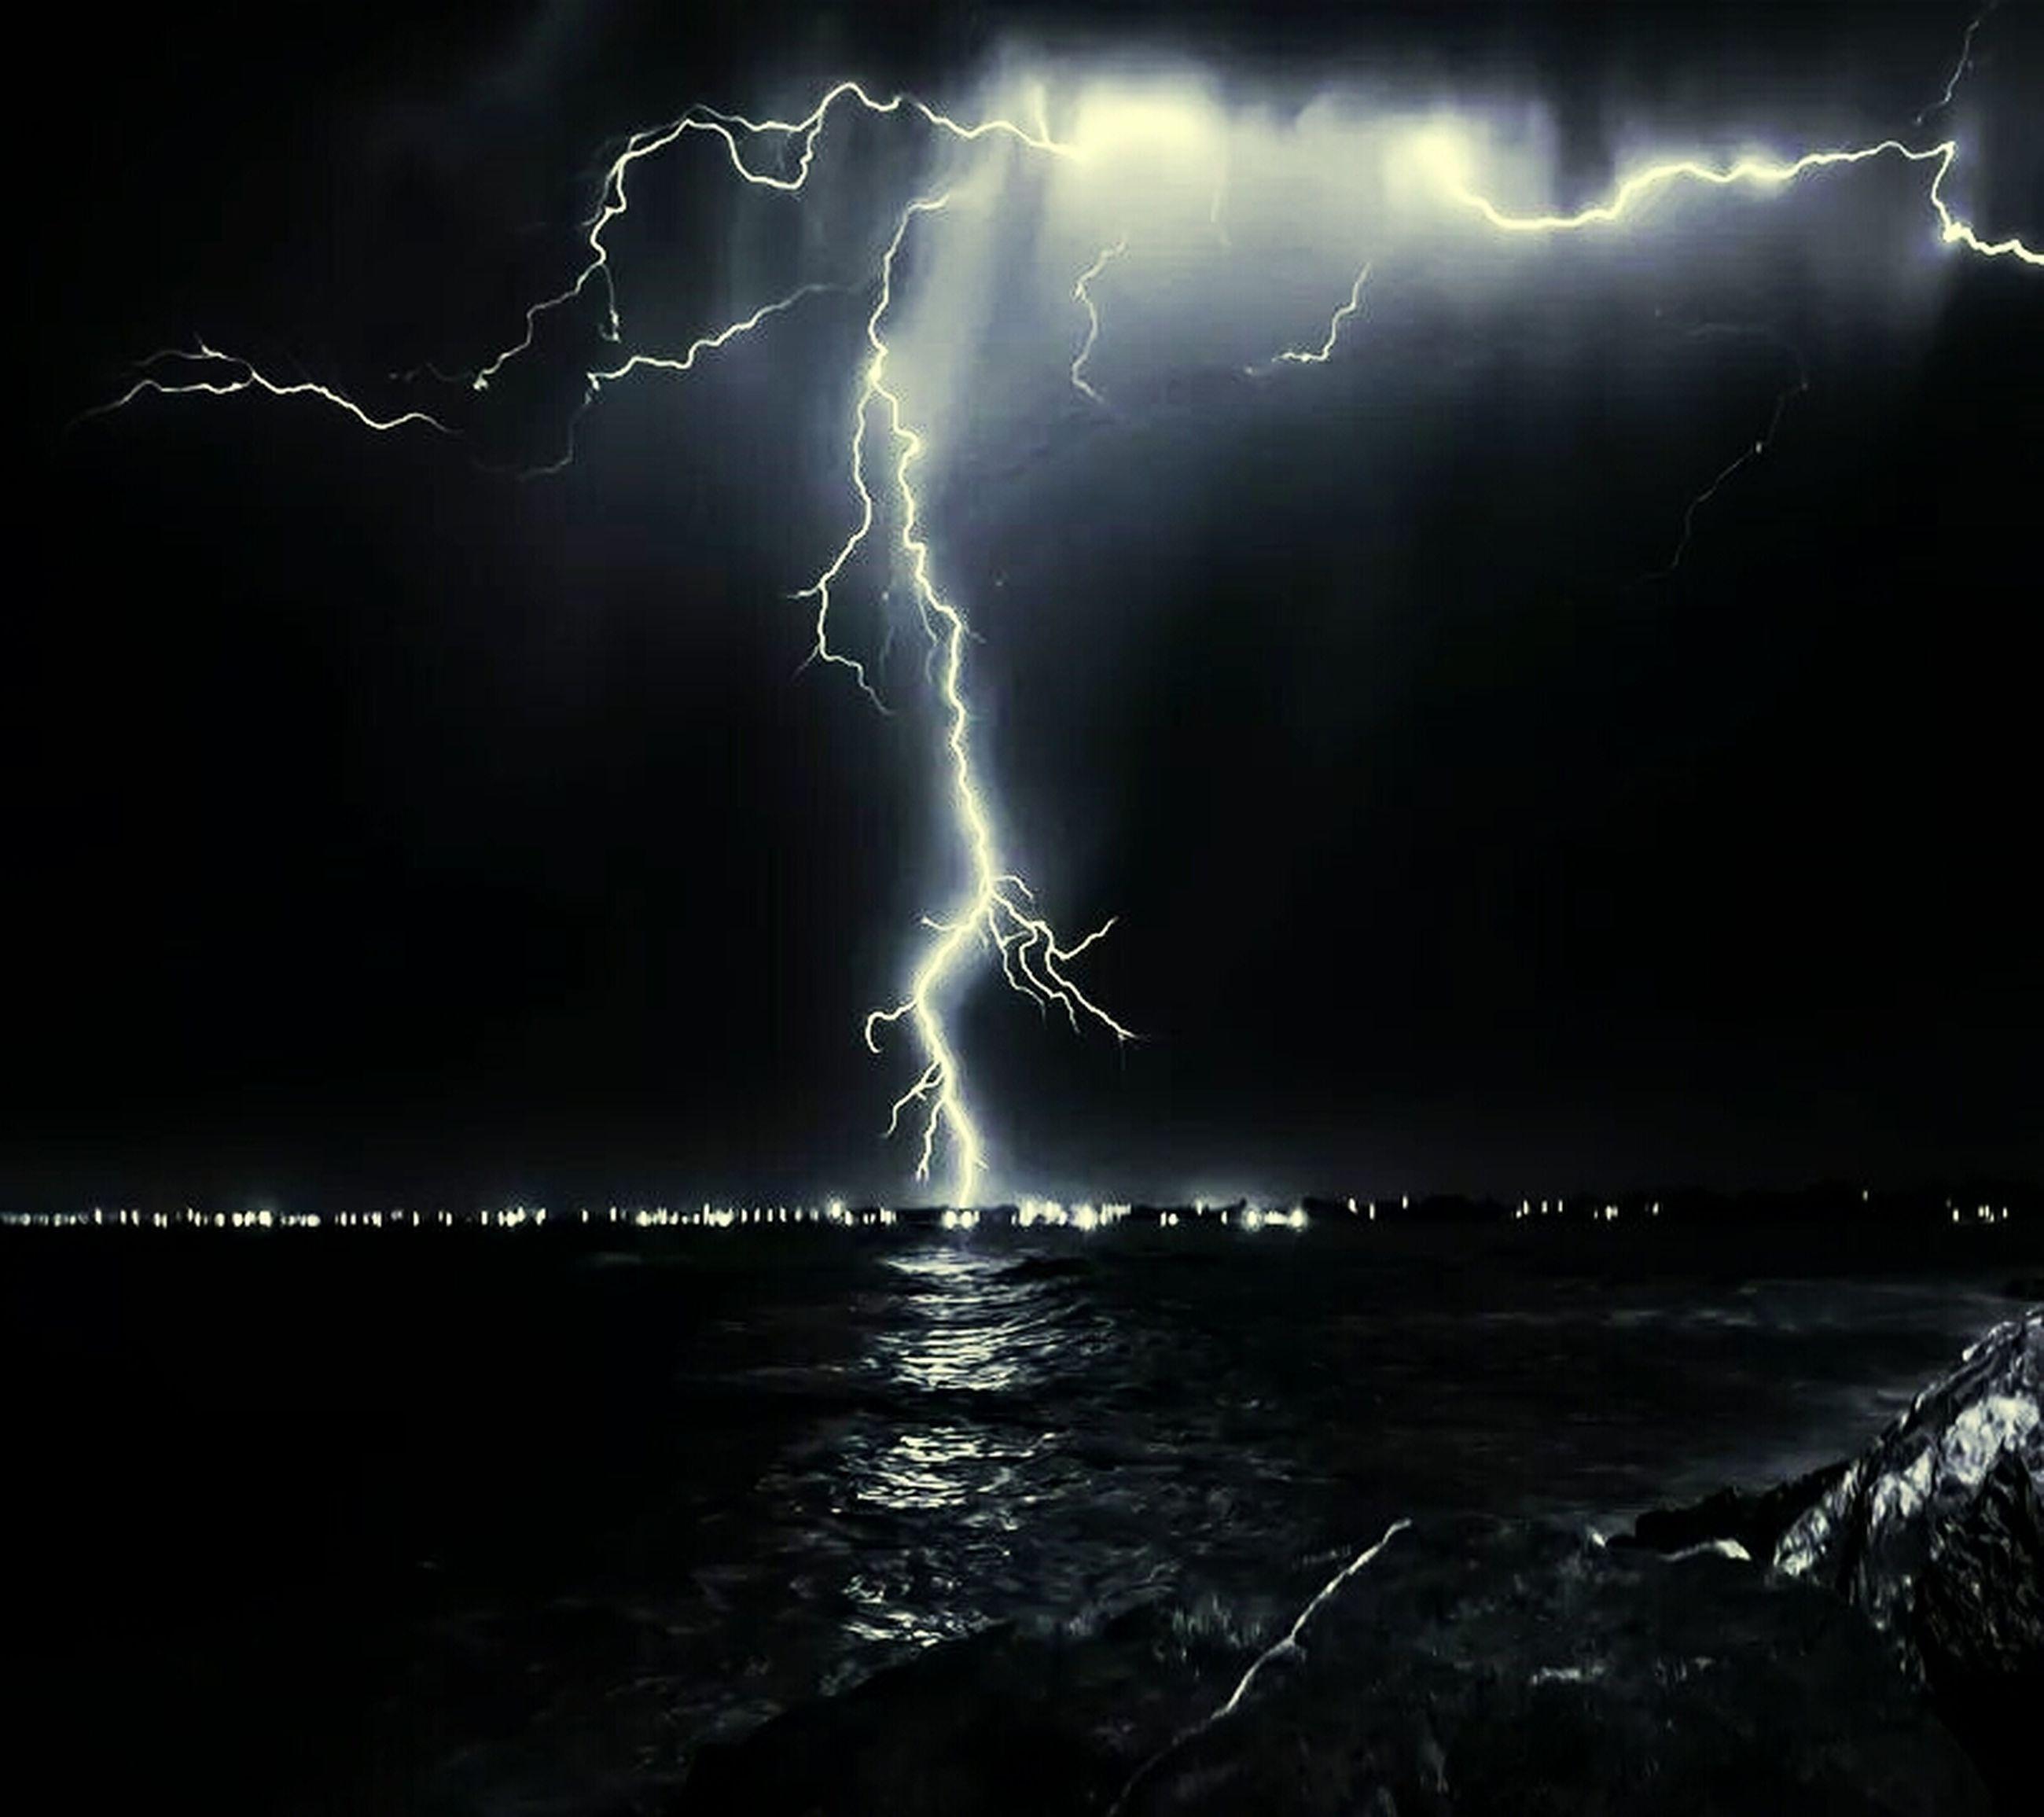 night, illuminated, long exposure, power in nature, water, sky, motion, lightning, thunderstorm, storm, glowing, sea, danger, scenics, beauty in nature, storm cloud, firework display, smoke - physical structure, light - natural phenomenon, splashing